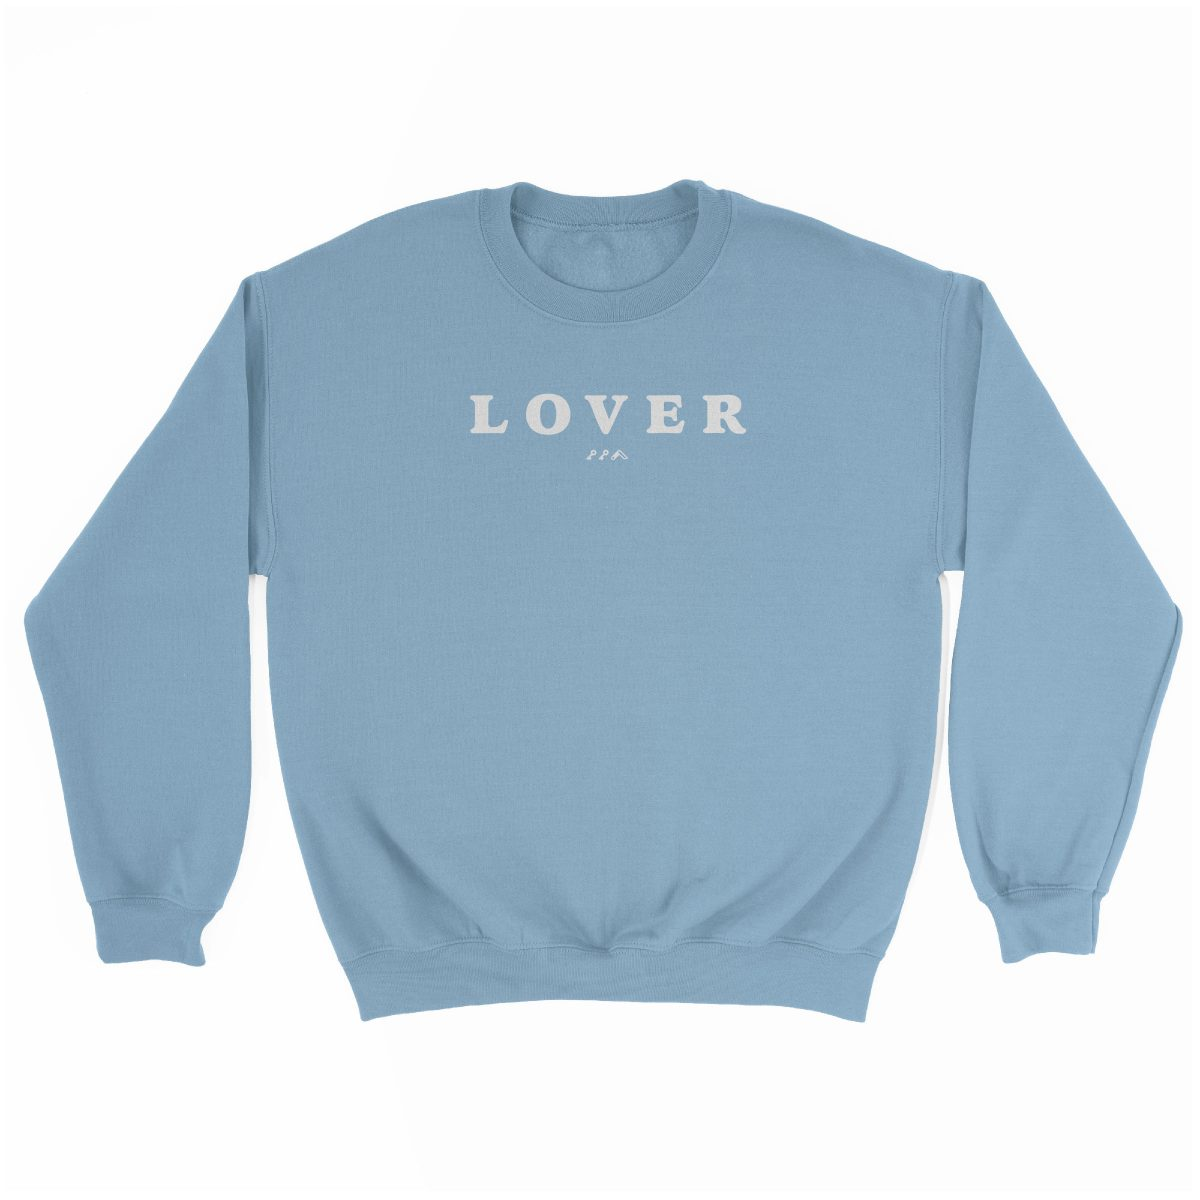 LOVER super soft unisex sweatshirt in light blue at kikicutt.com